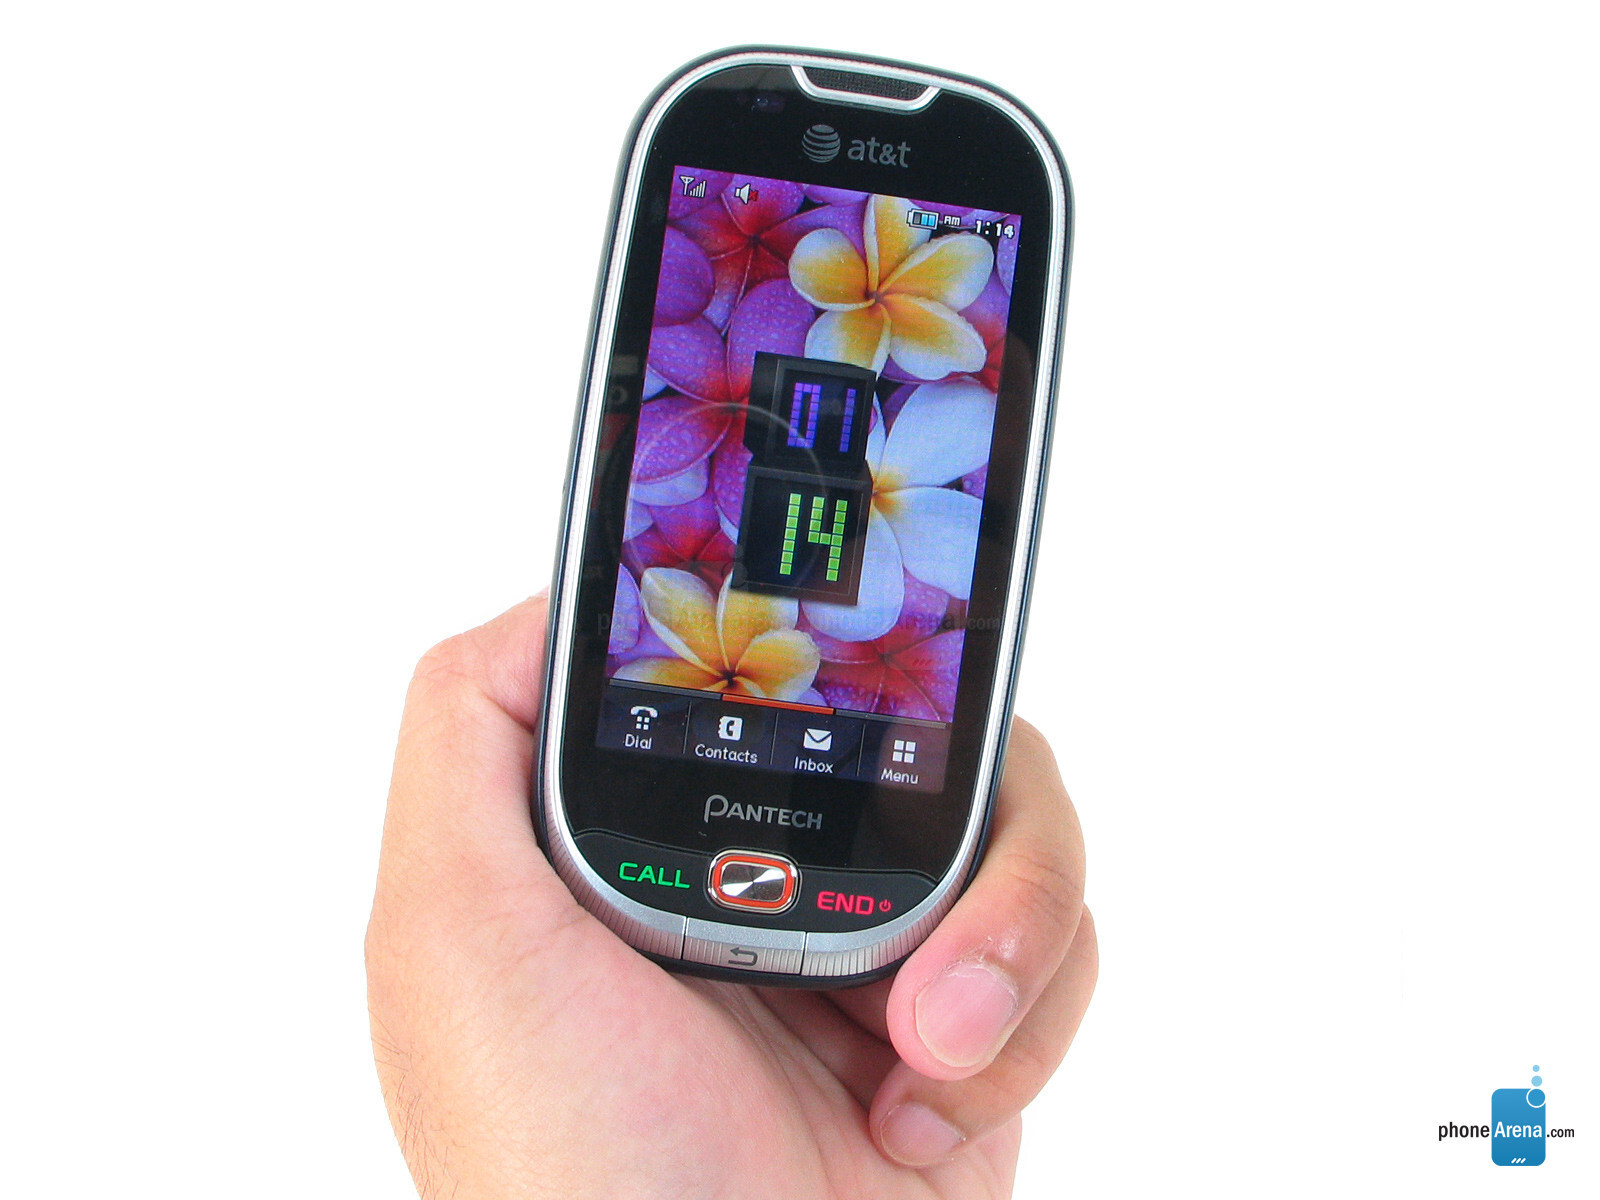 Pantech Laser Phone Cases Pantech ease. follow following